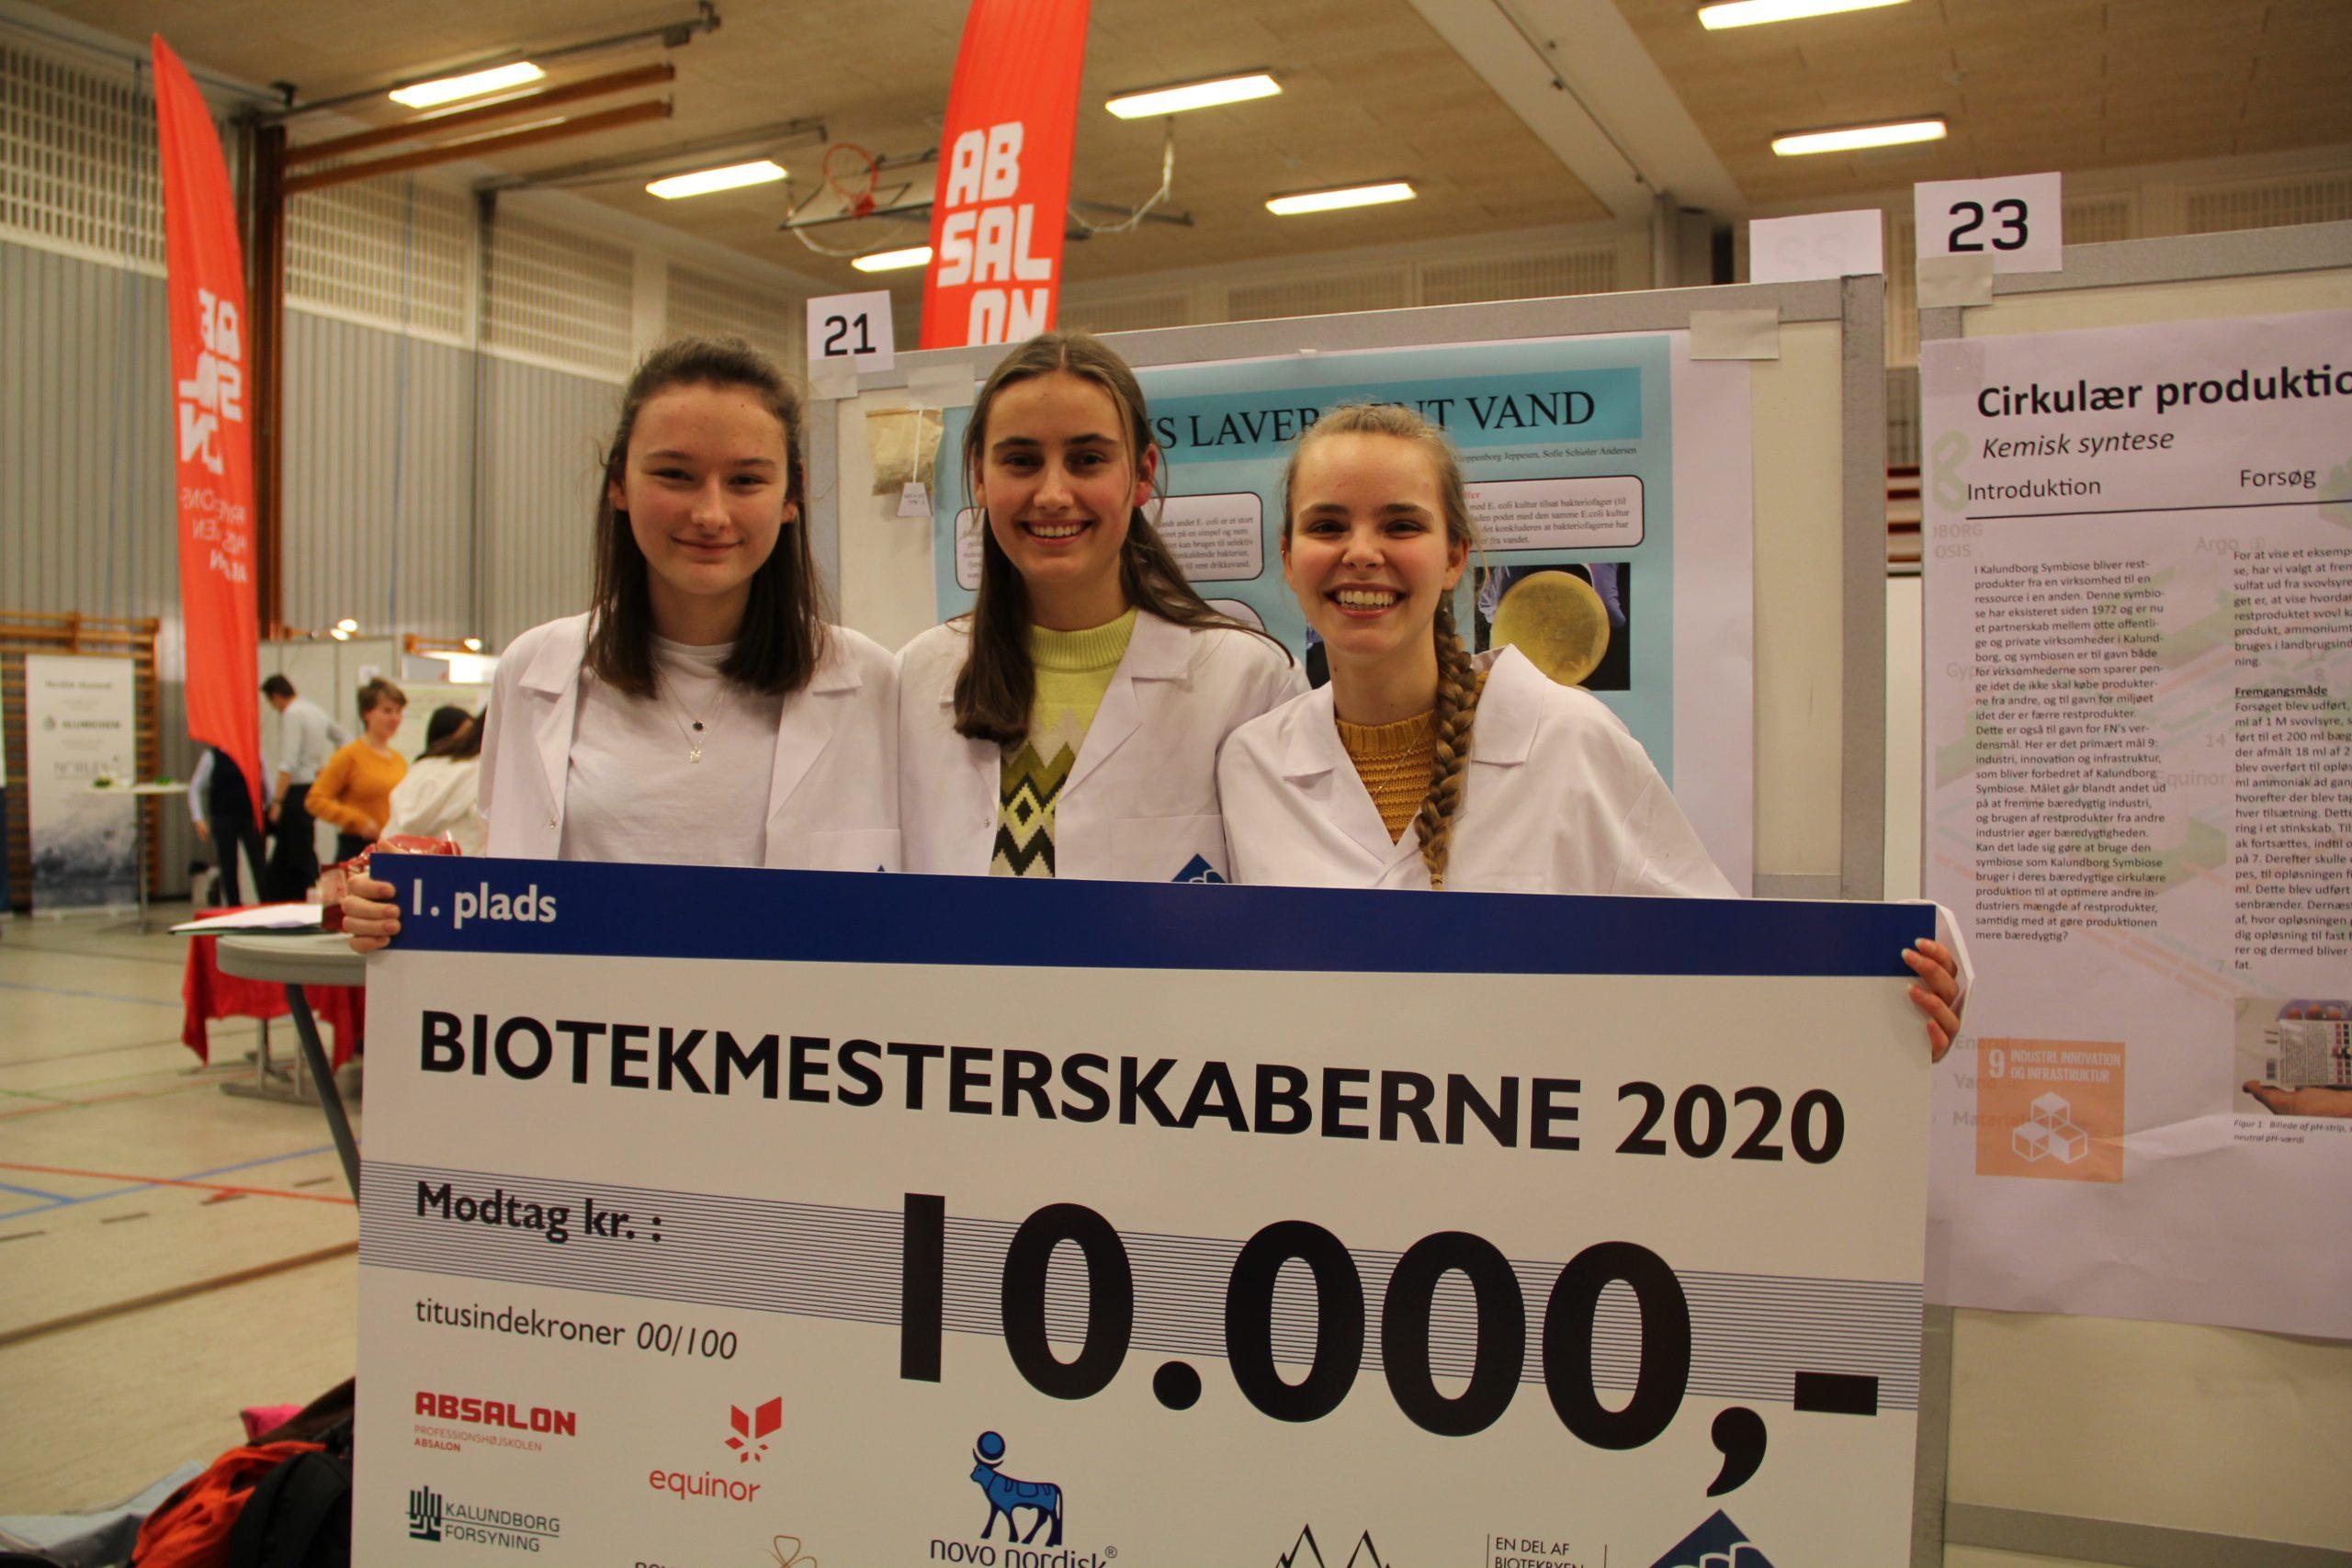 Vindere af Biotekmesterskab